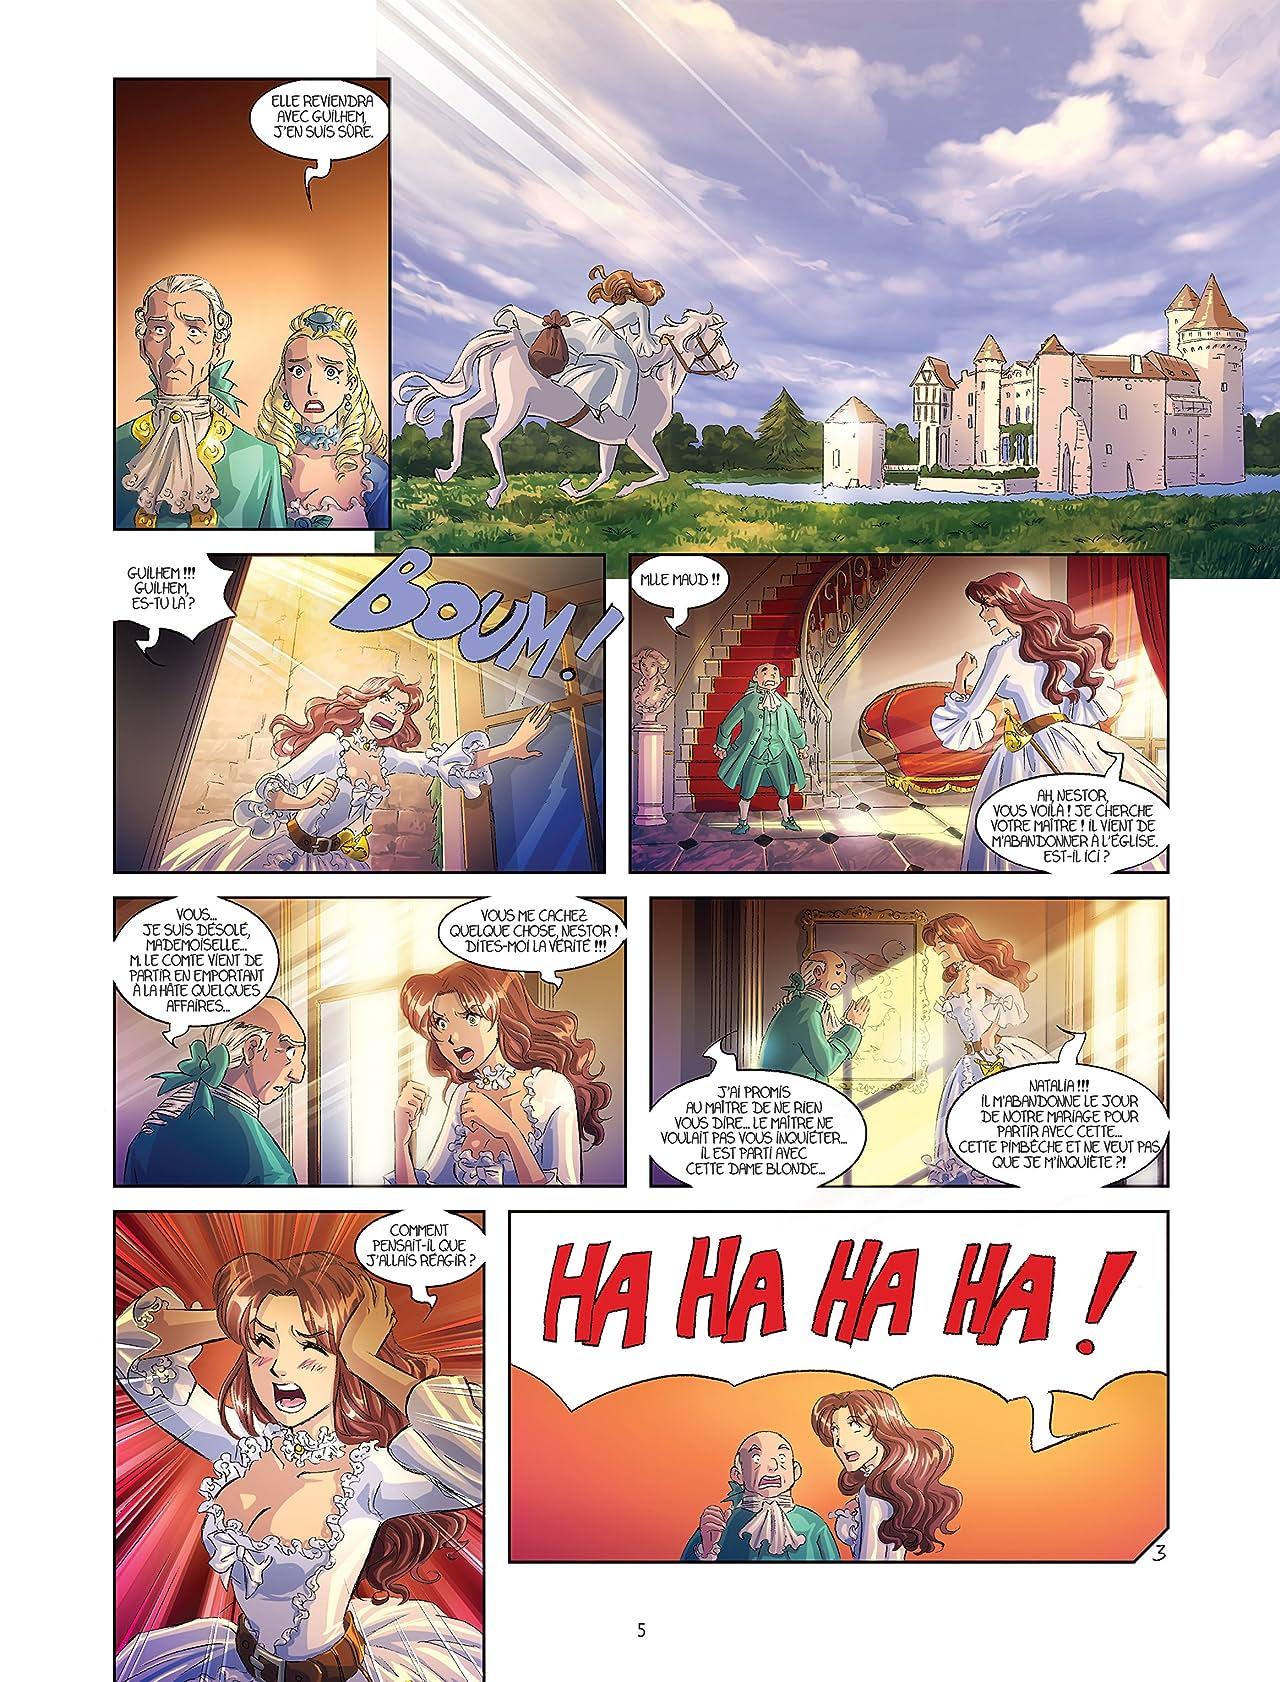 La Rose écarlate Vol. 8: Où es-tu ?